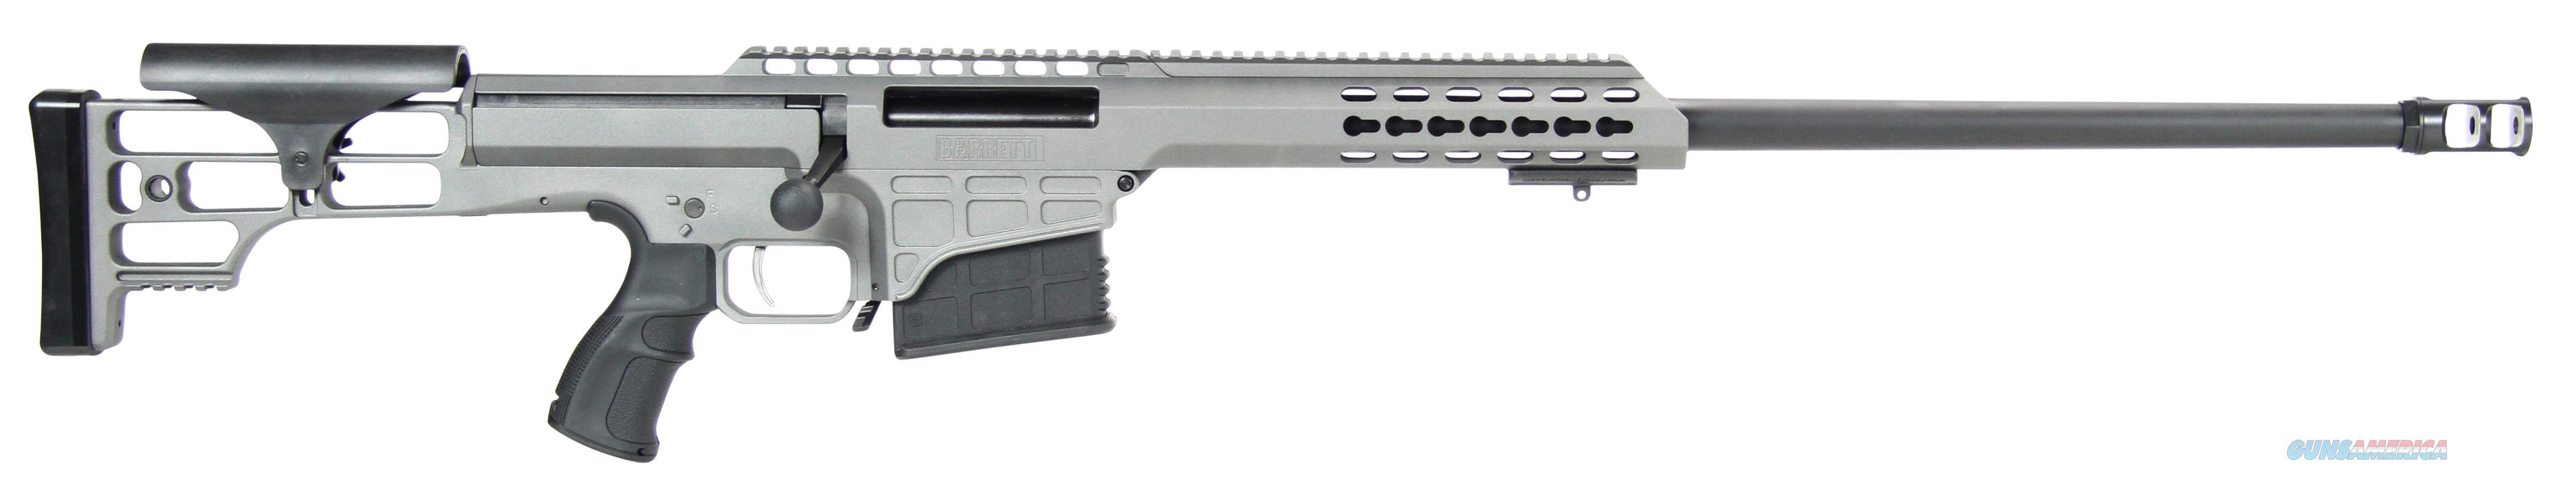 Barrett 98B 338Lap 24 Tactical Tungsten Gry 14802  Guns > Rifles > Barrett Rifles